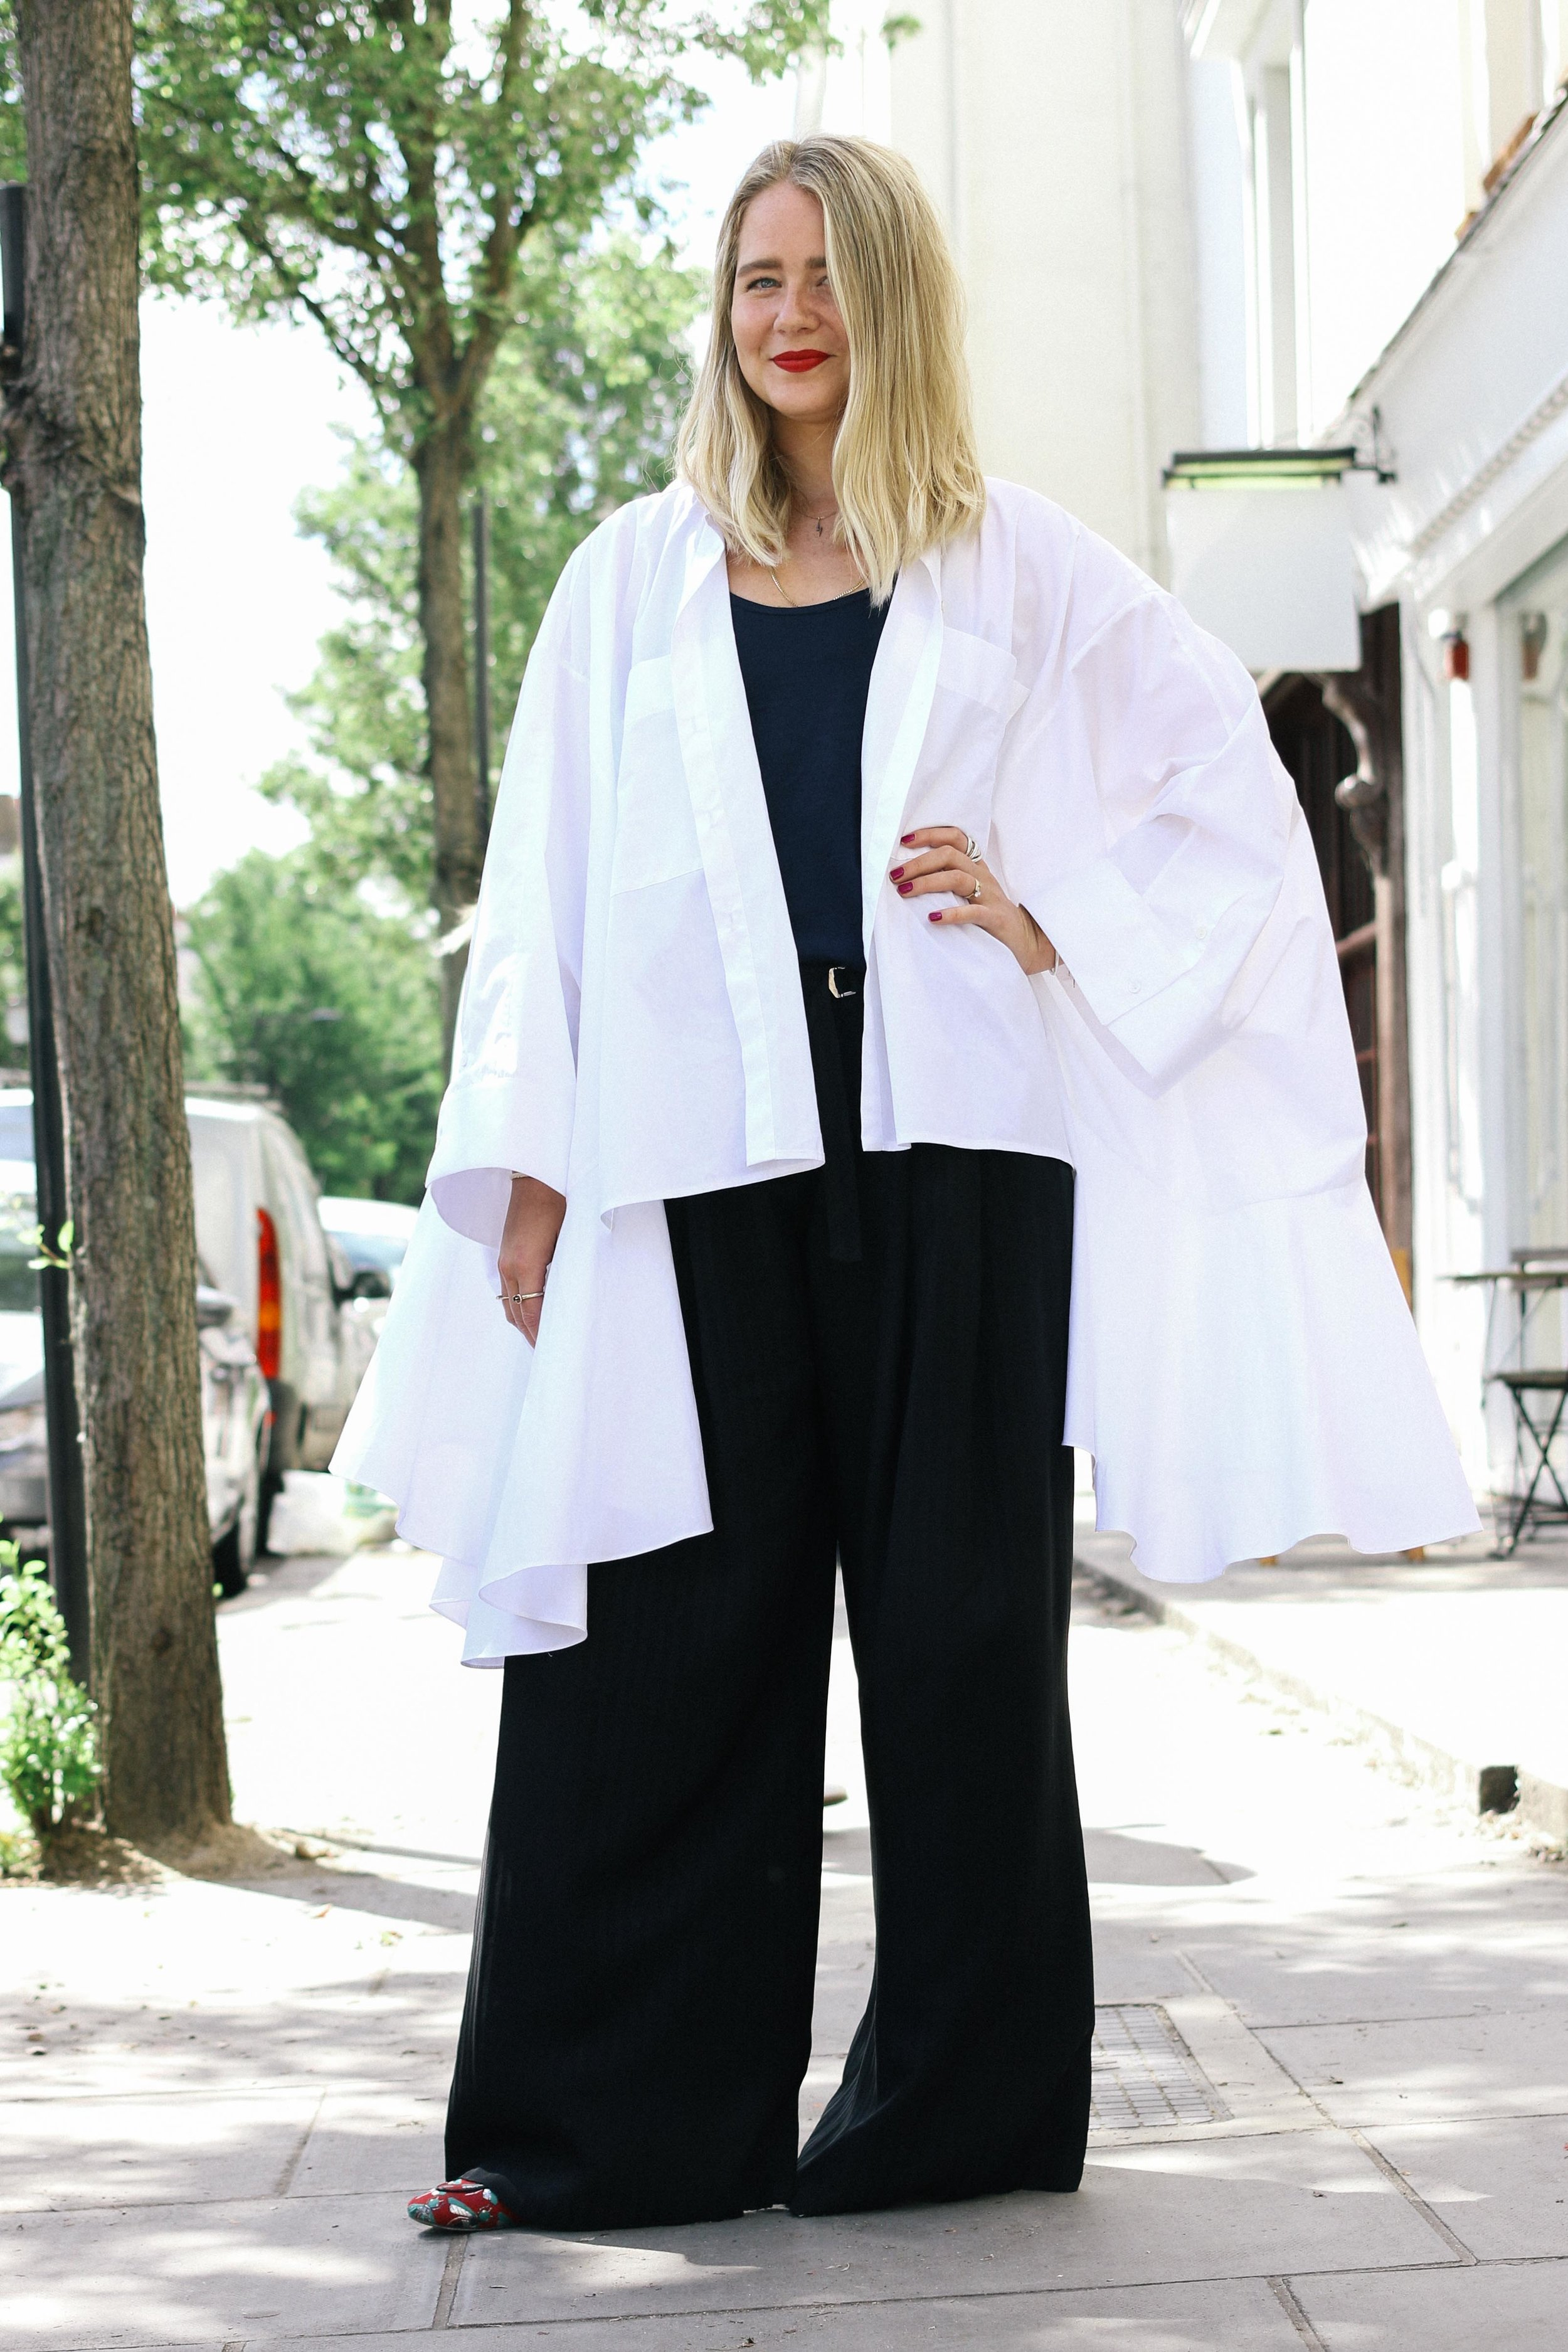 Street fashion stories_Imaginealady_white_shirt